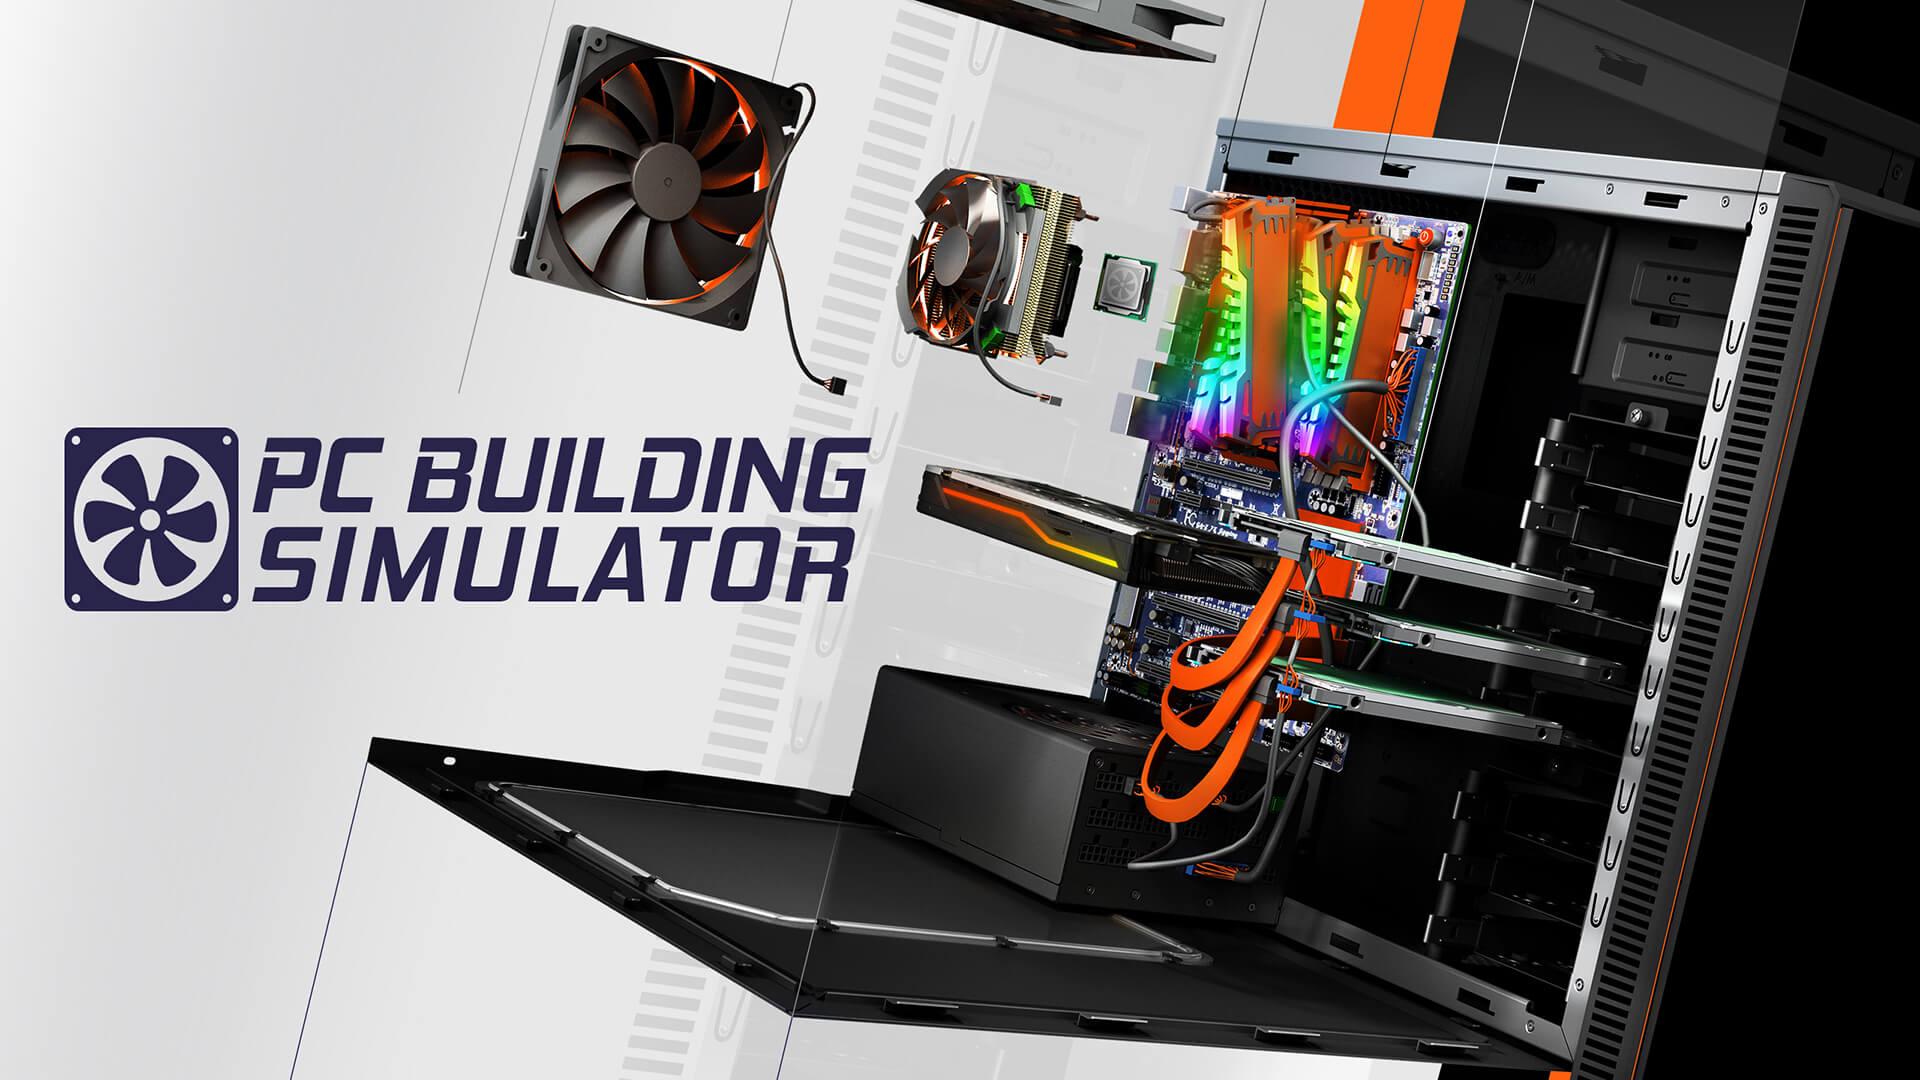 PC Building Simulator próximamente - Epic Games Store